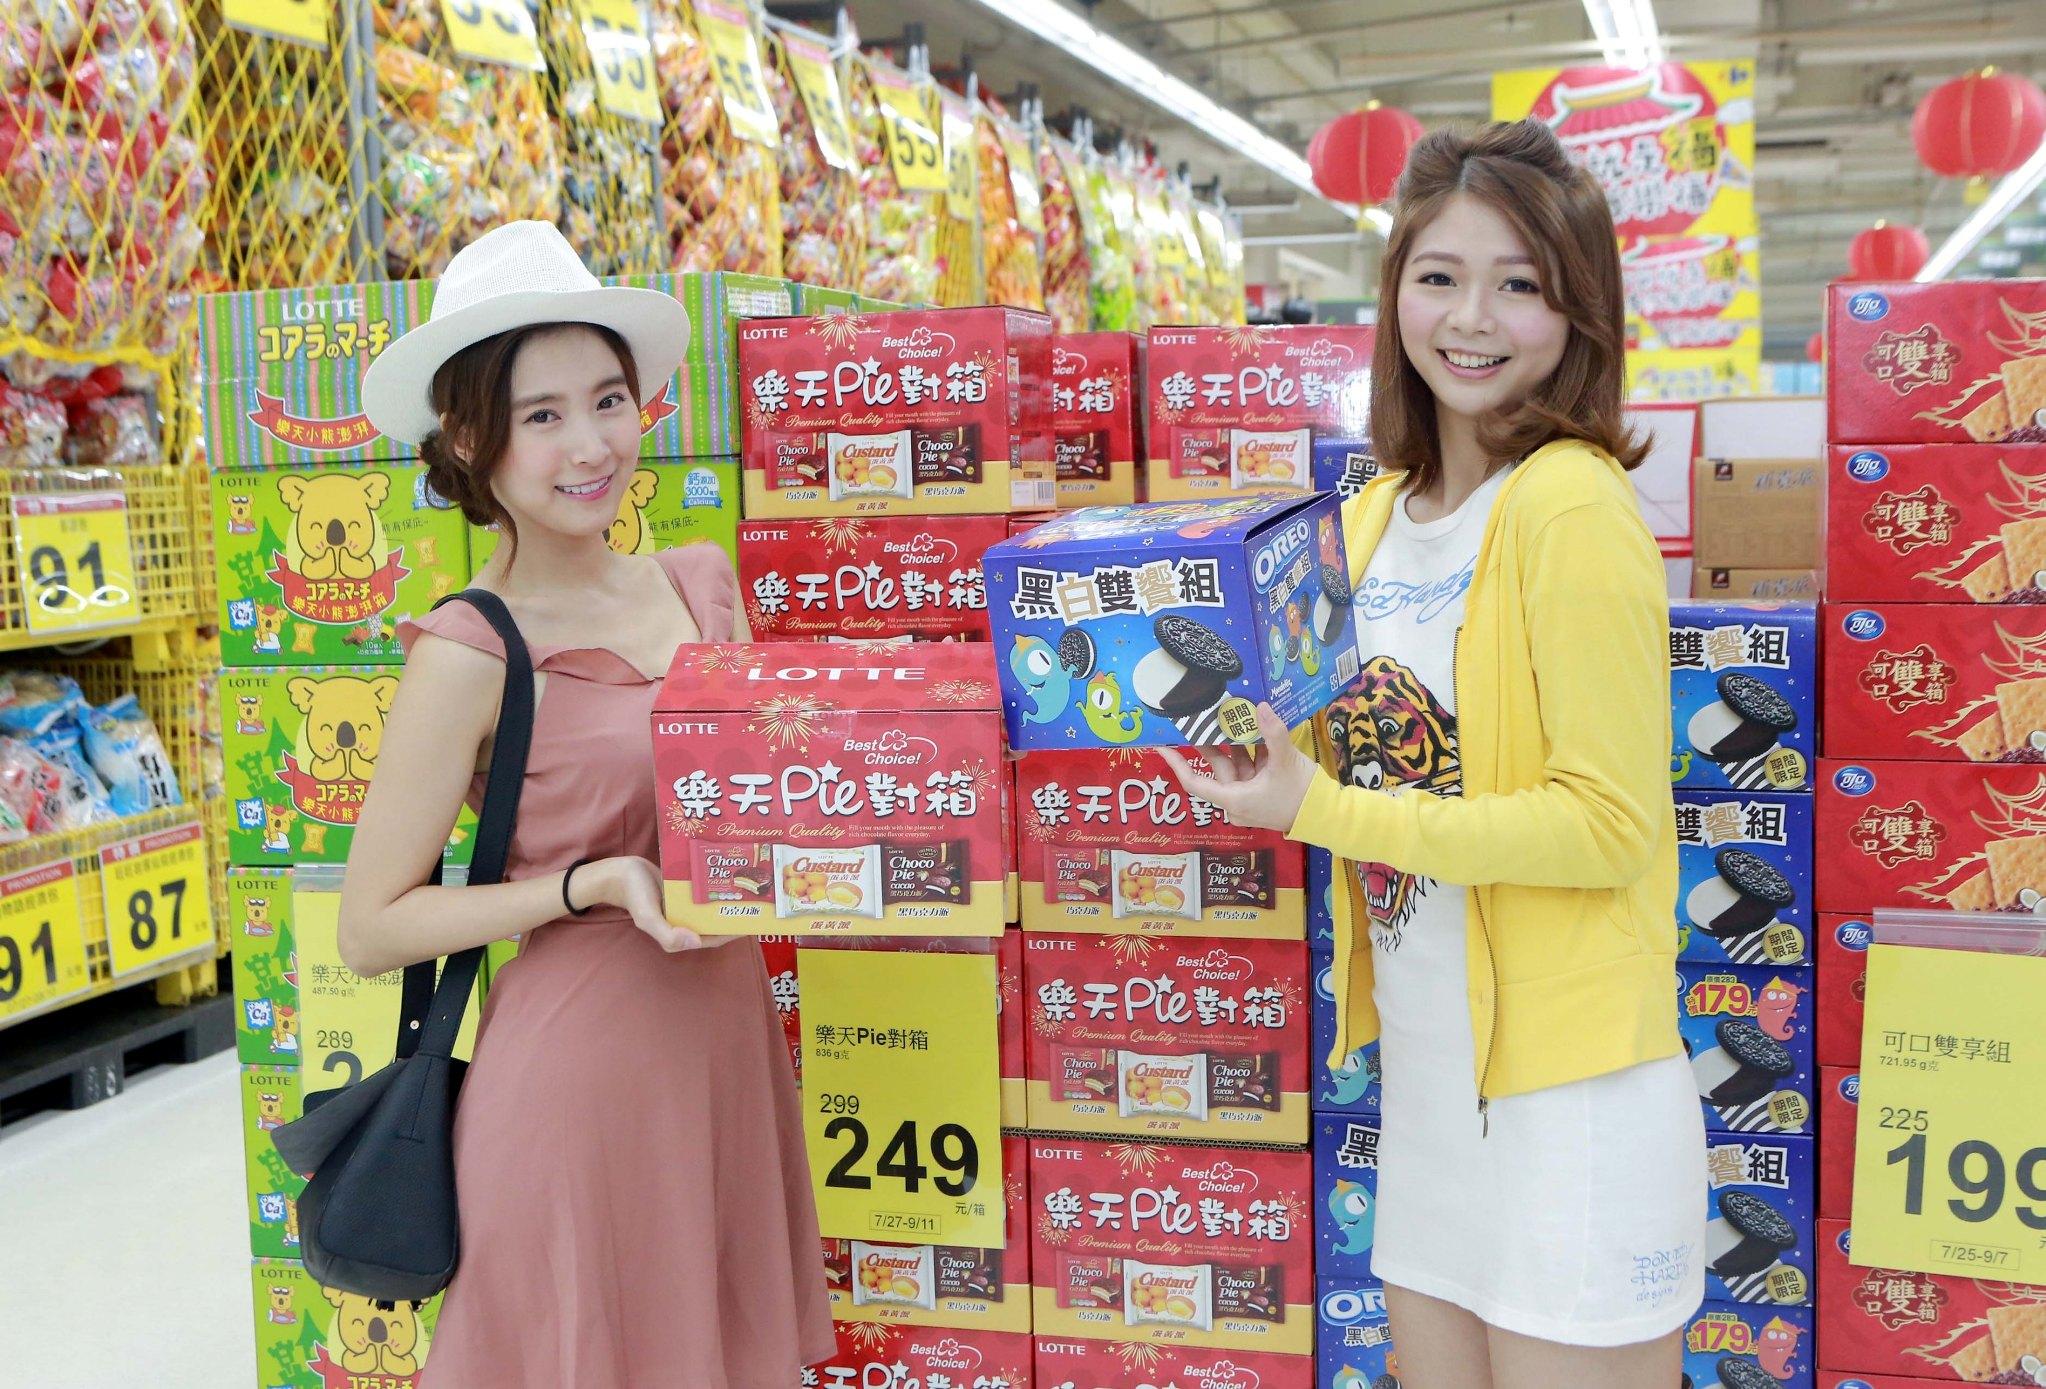 Carrefour Taiwan rolls out deep discounts for Zhongyuan Ghost Festival